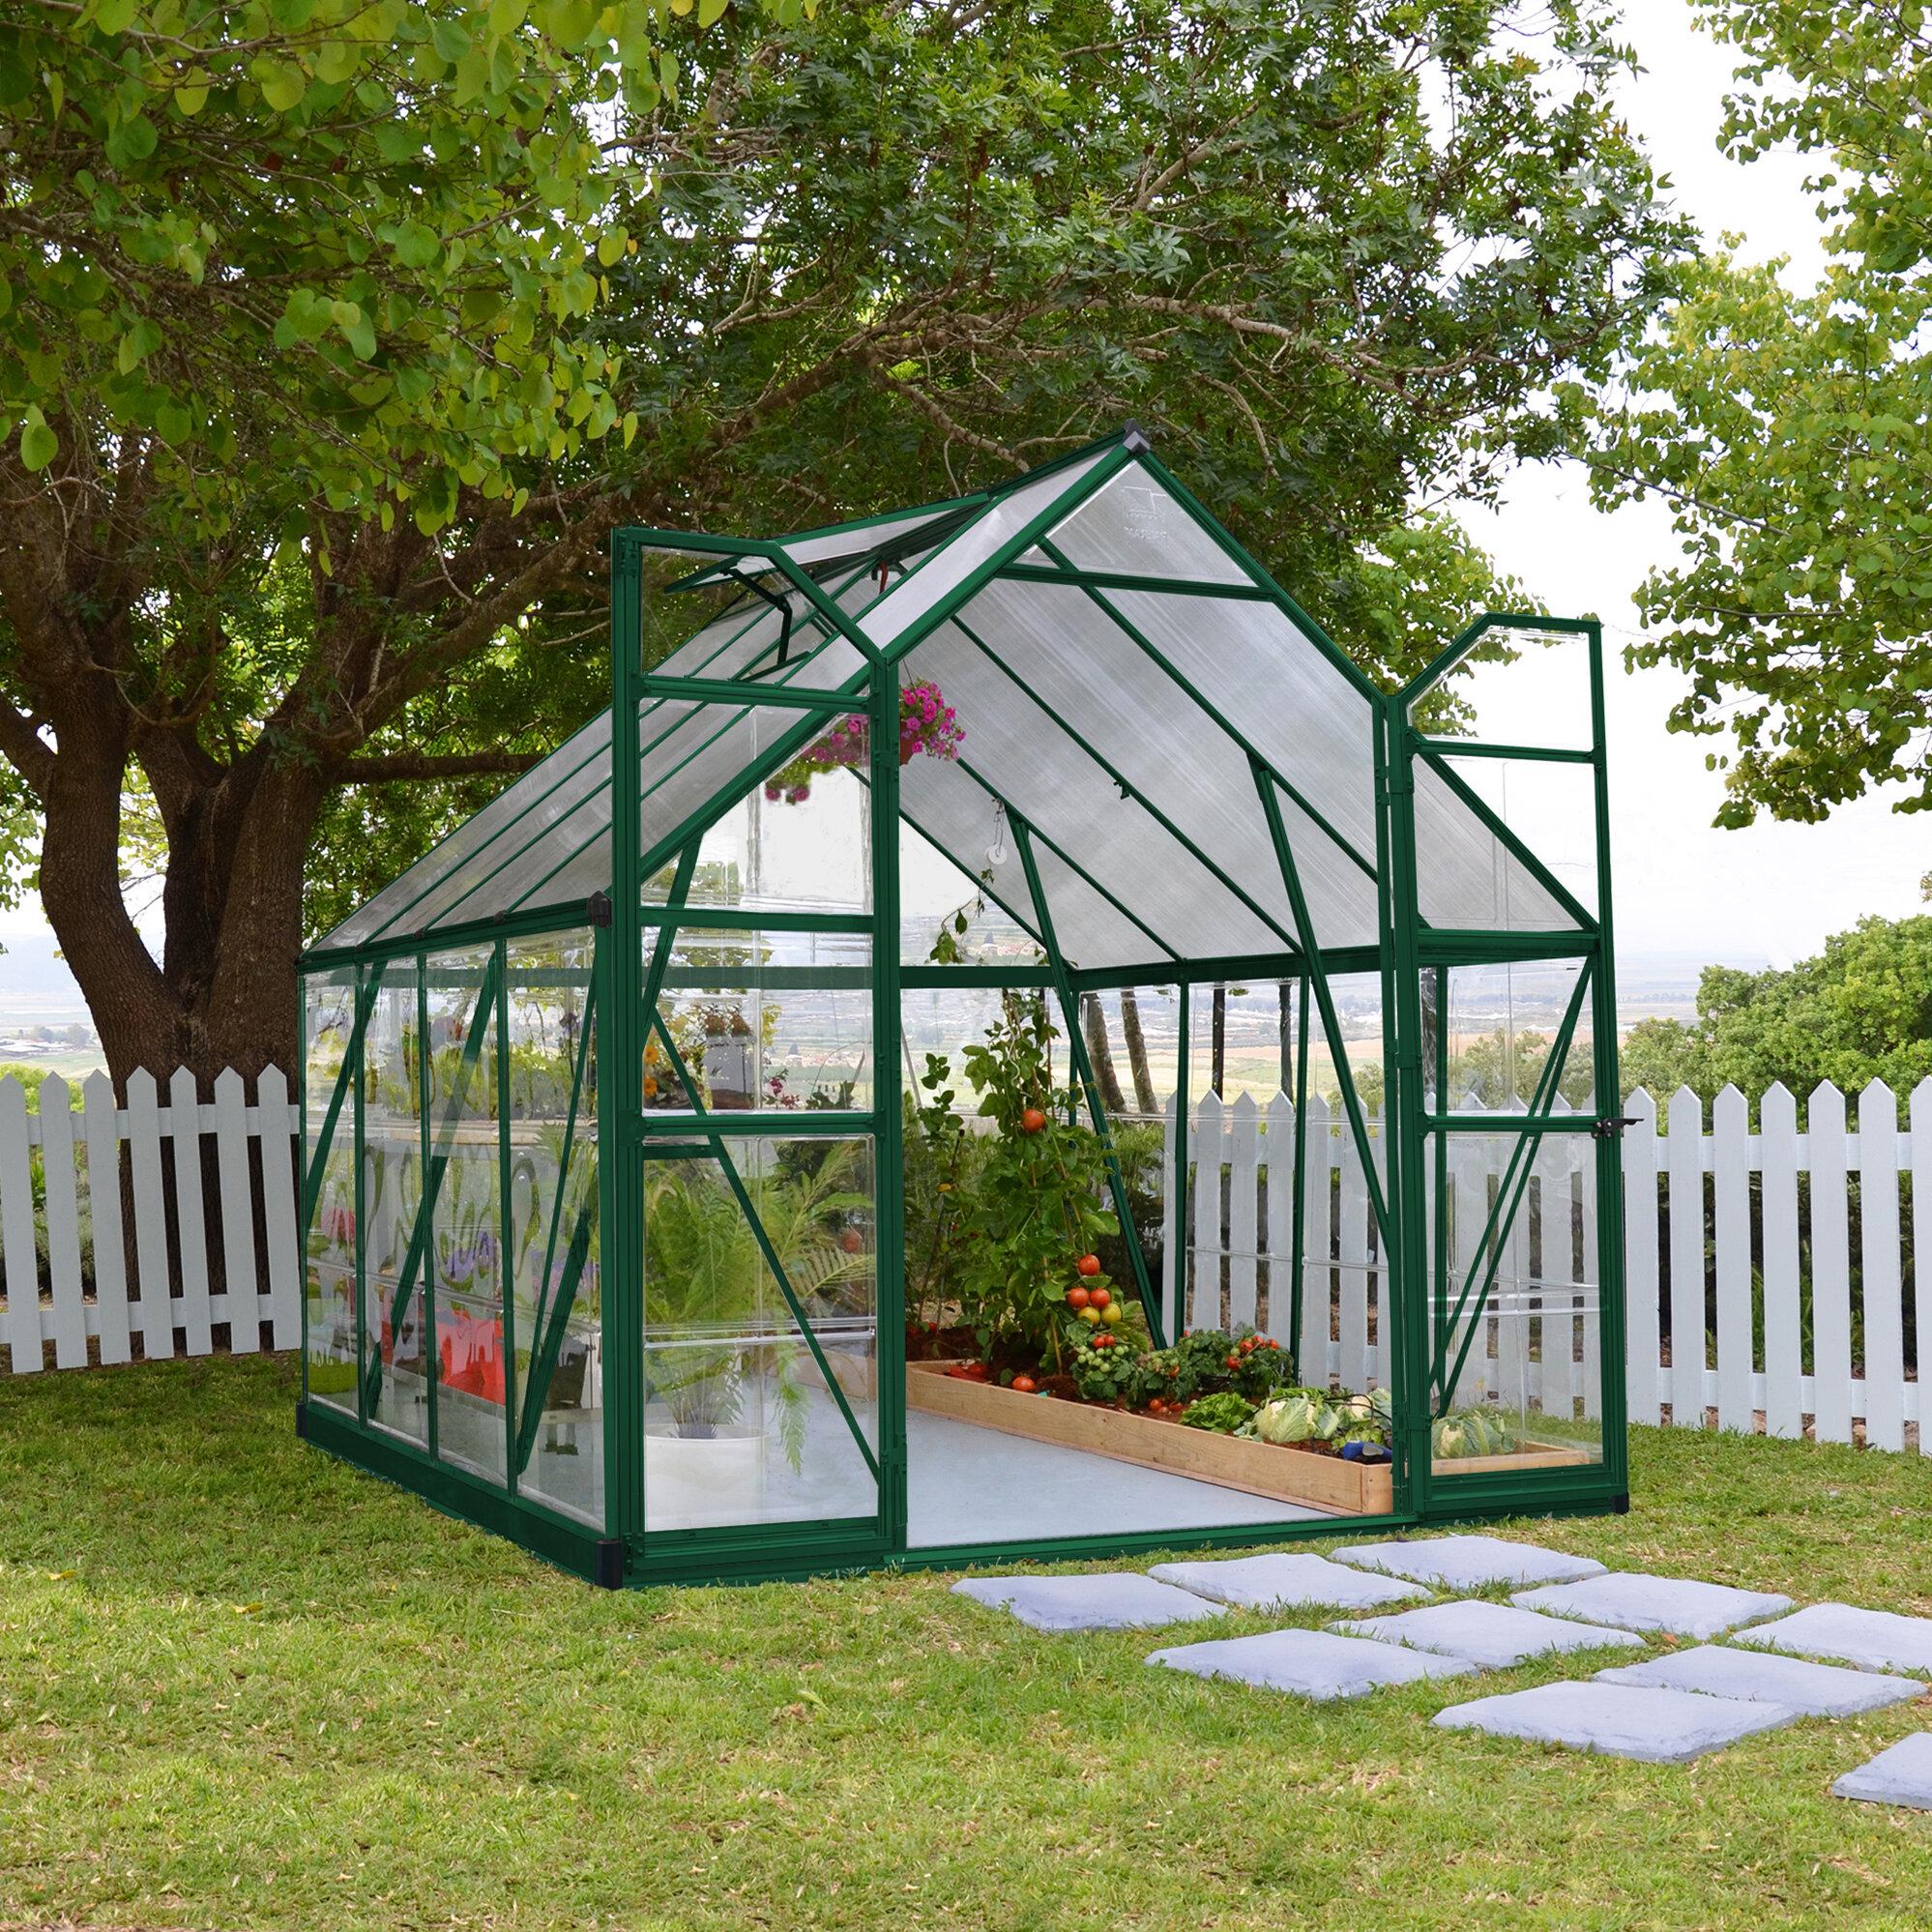 Balance 8 Ft  W x 8 Ft  D Greenhouse